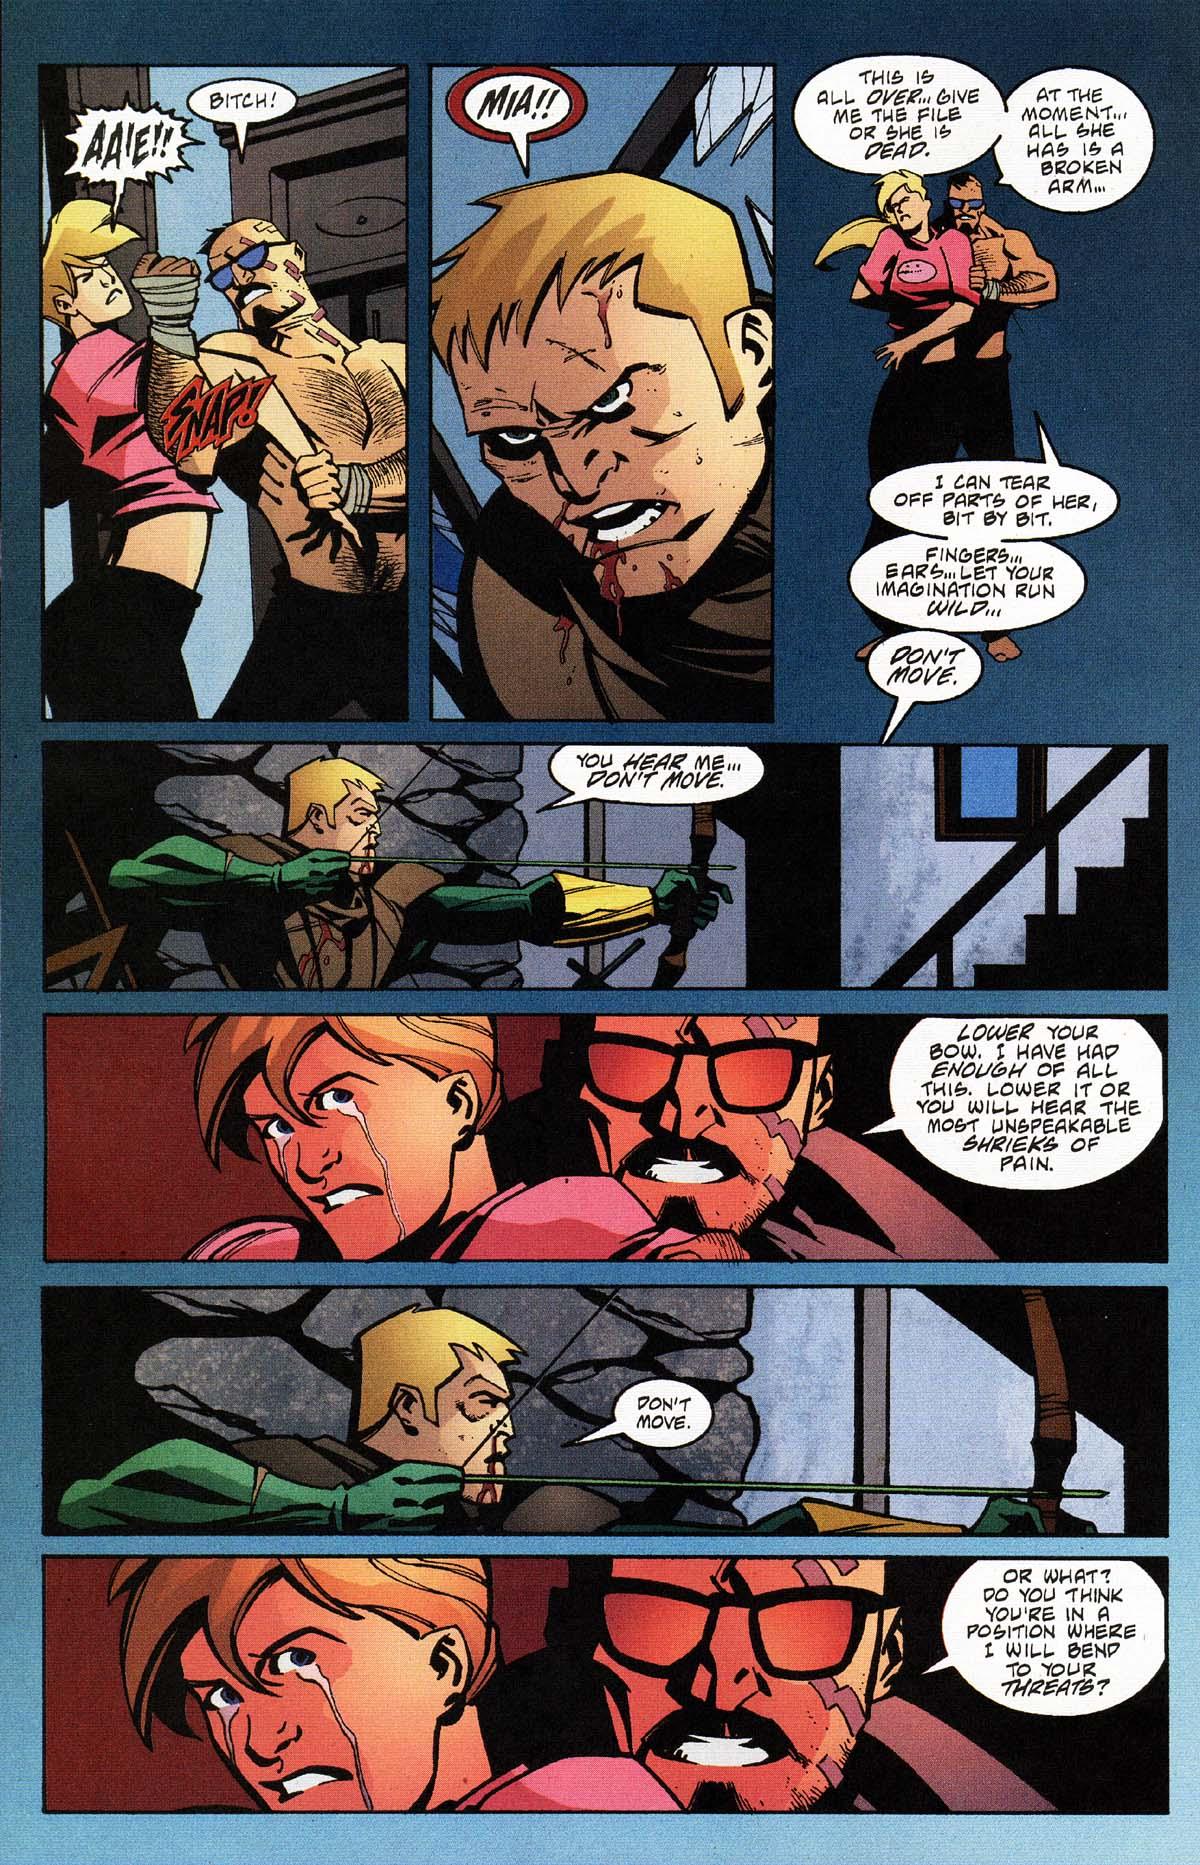 Green Arrow v4 031-13 Connor Hawke Constantine Drakon Mia Dearden.JPG